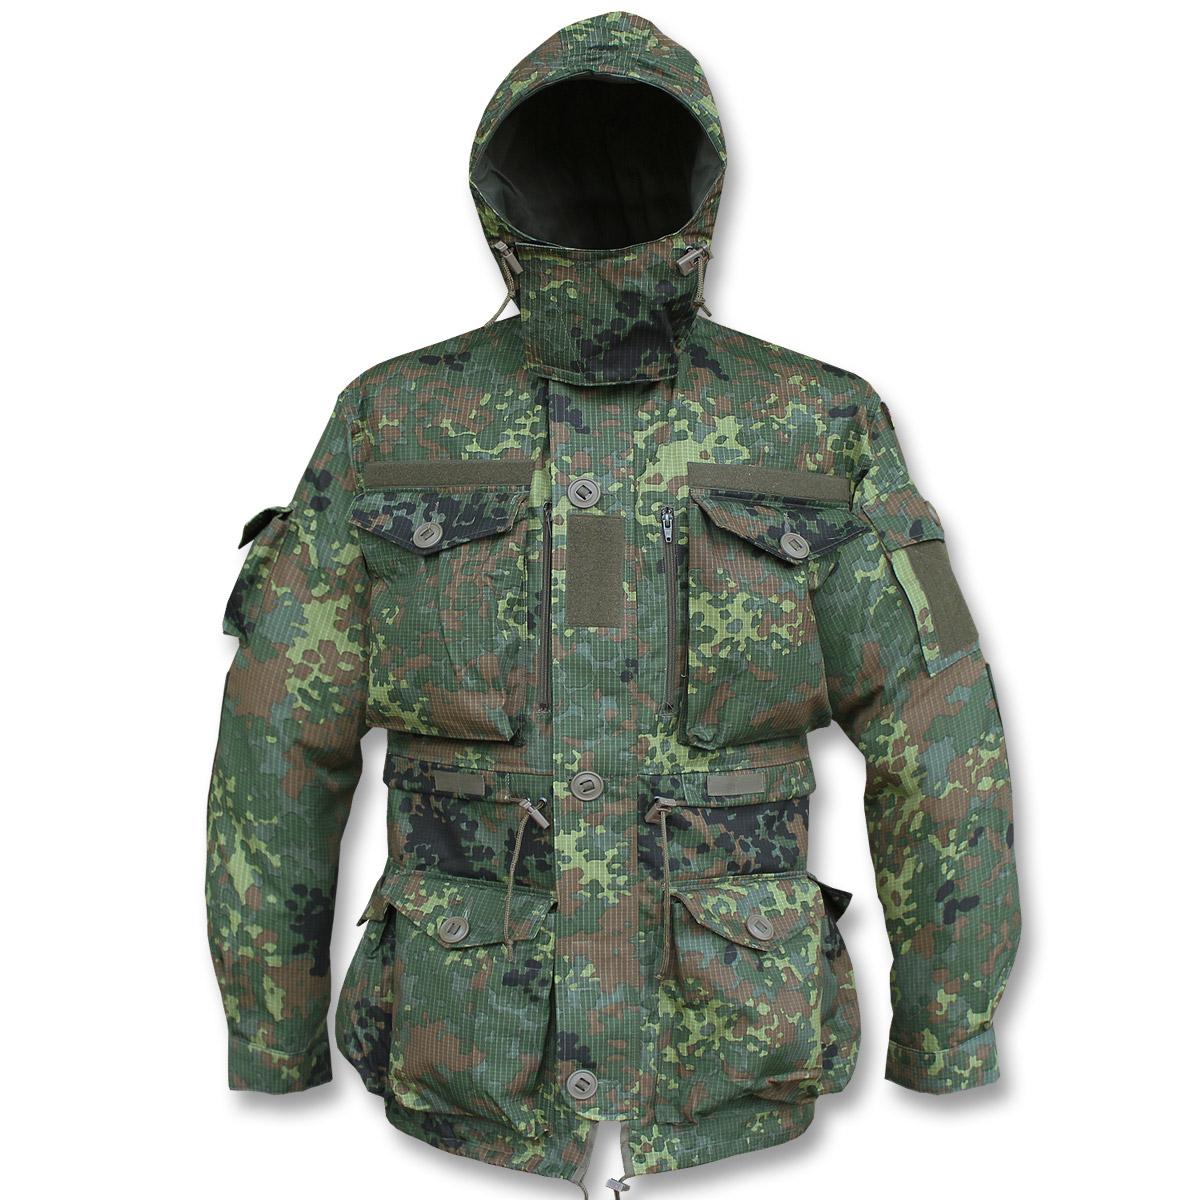 tactical smock jacke übergröße kaufen